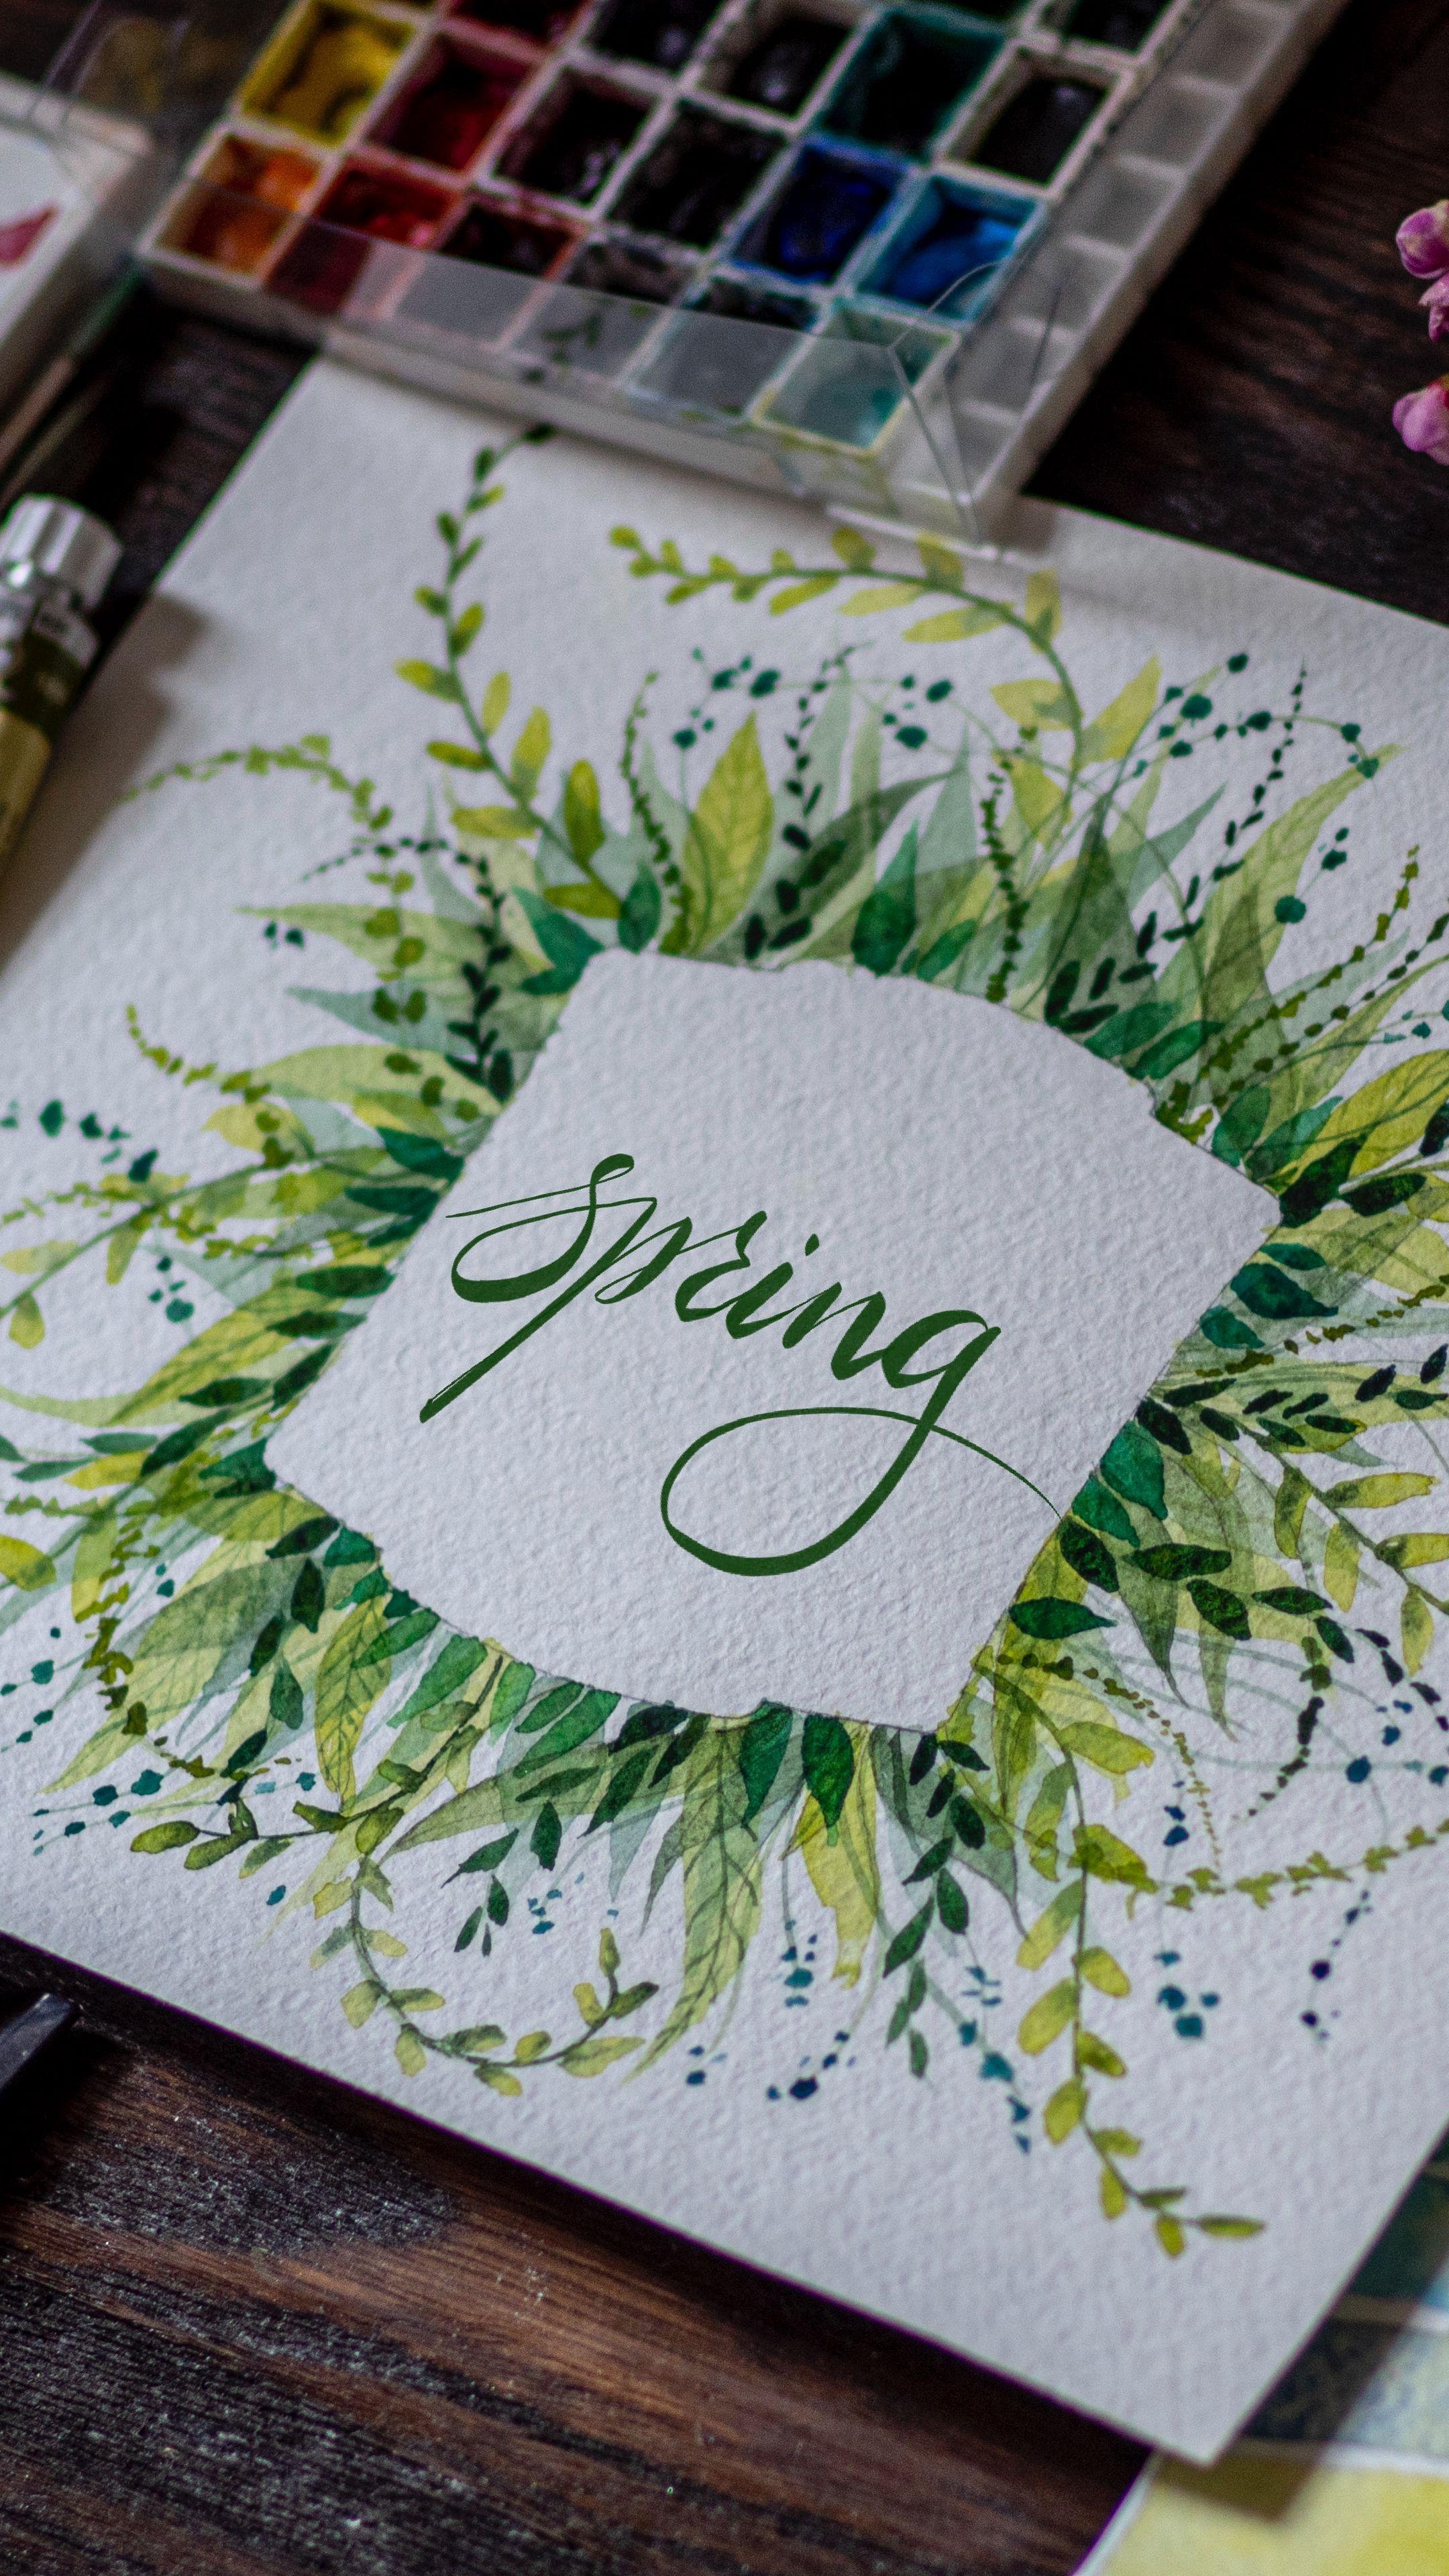 2160x3840 Обои весна, слово, леттеринг, краски, акварель